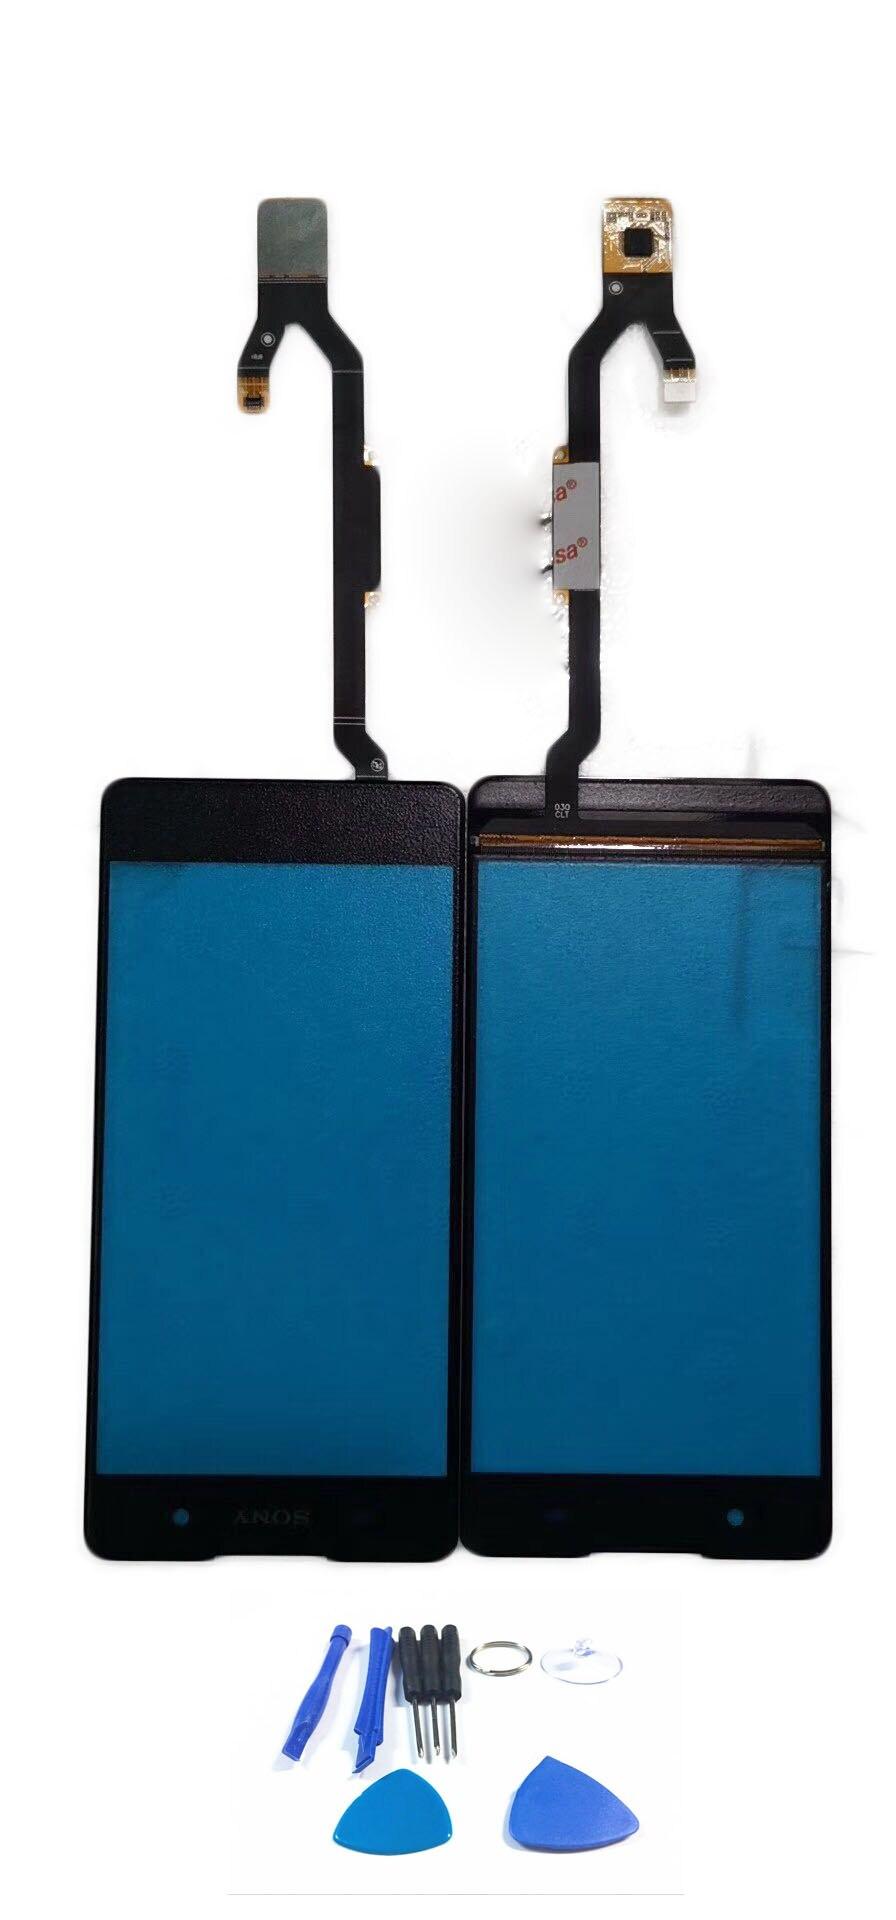 "5,0 ""Panel táctil para Sony Xperia E5 f3311 f3313 Digitalizador de pantalla táctil Sensor de recambio de lentes de vidrio frontal + herramienta"